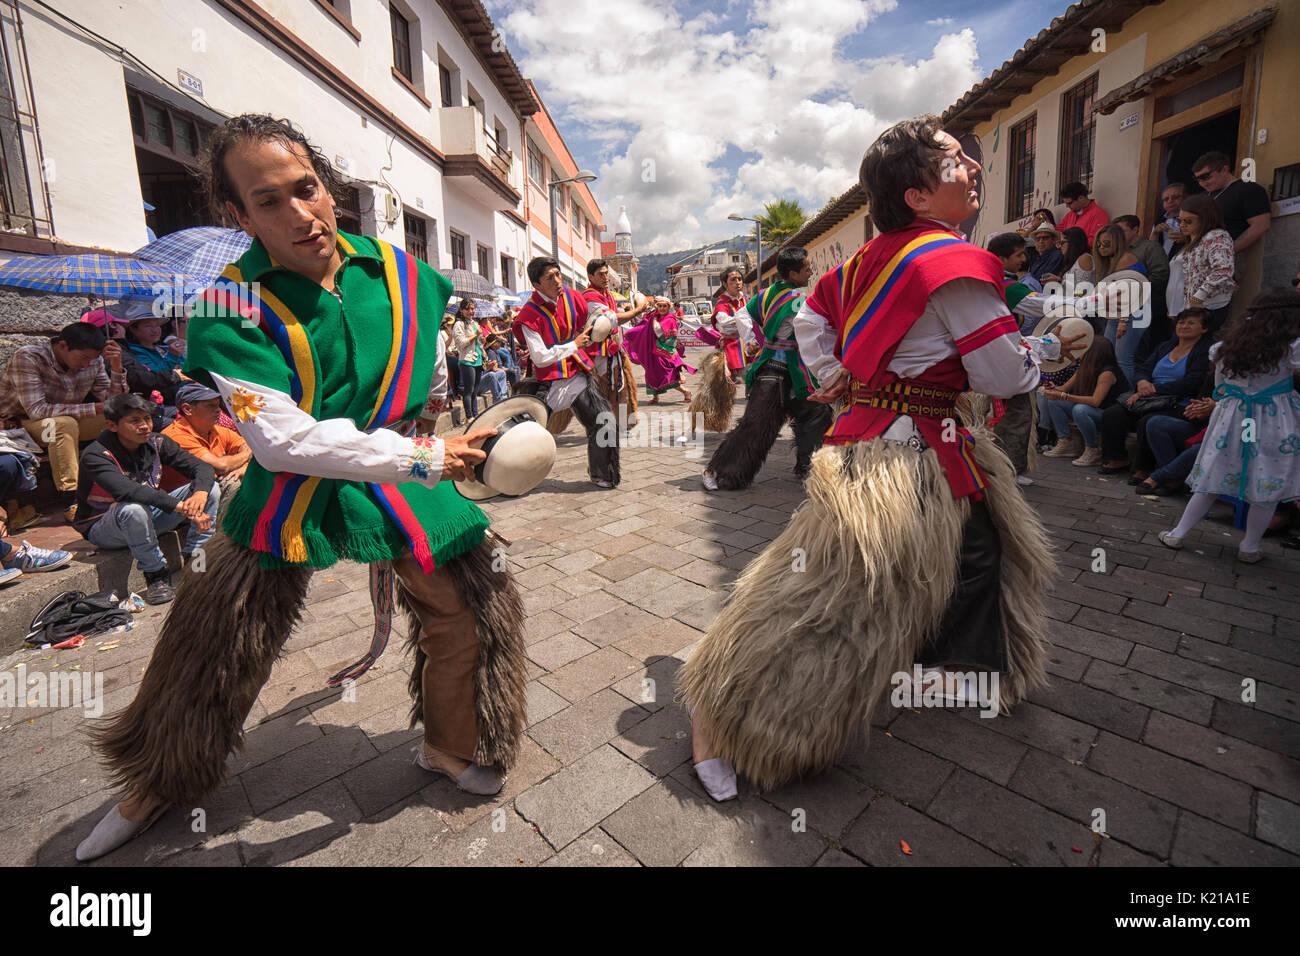 June 17, 2017 Pujili, Ecuador: dancers performing on the street during Corpus Christi parade - Stock Image